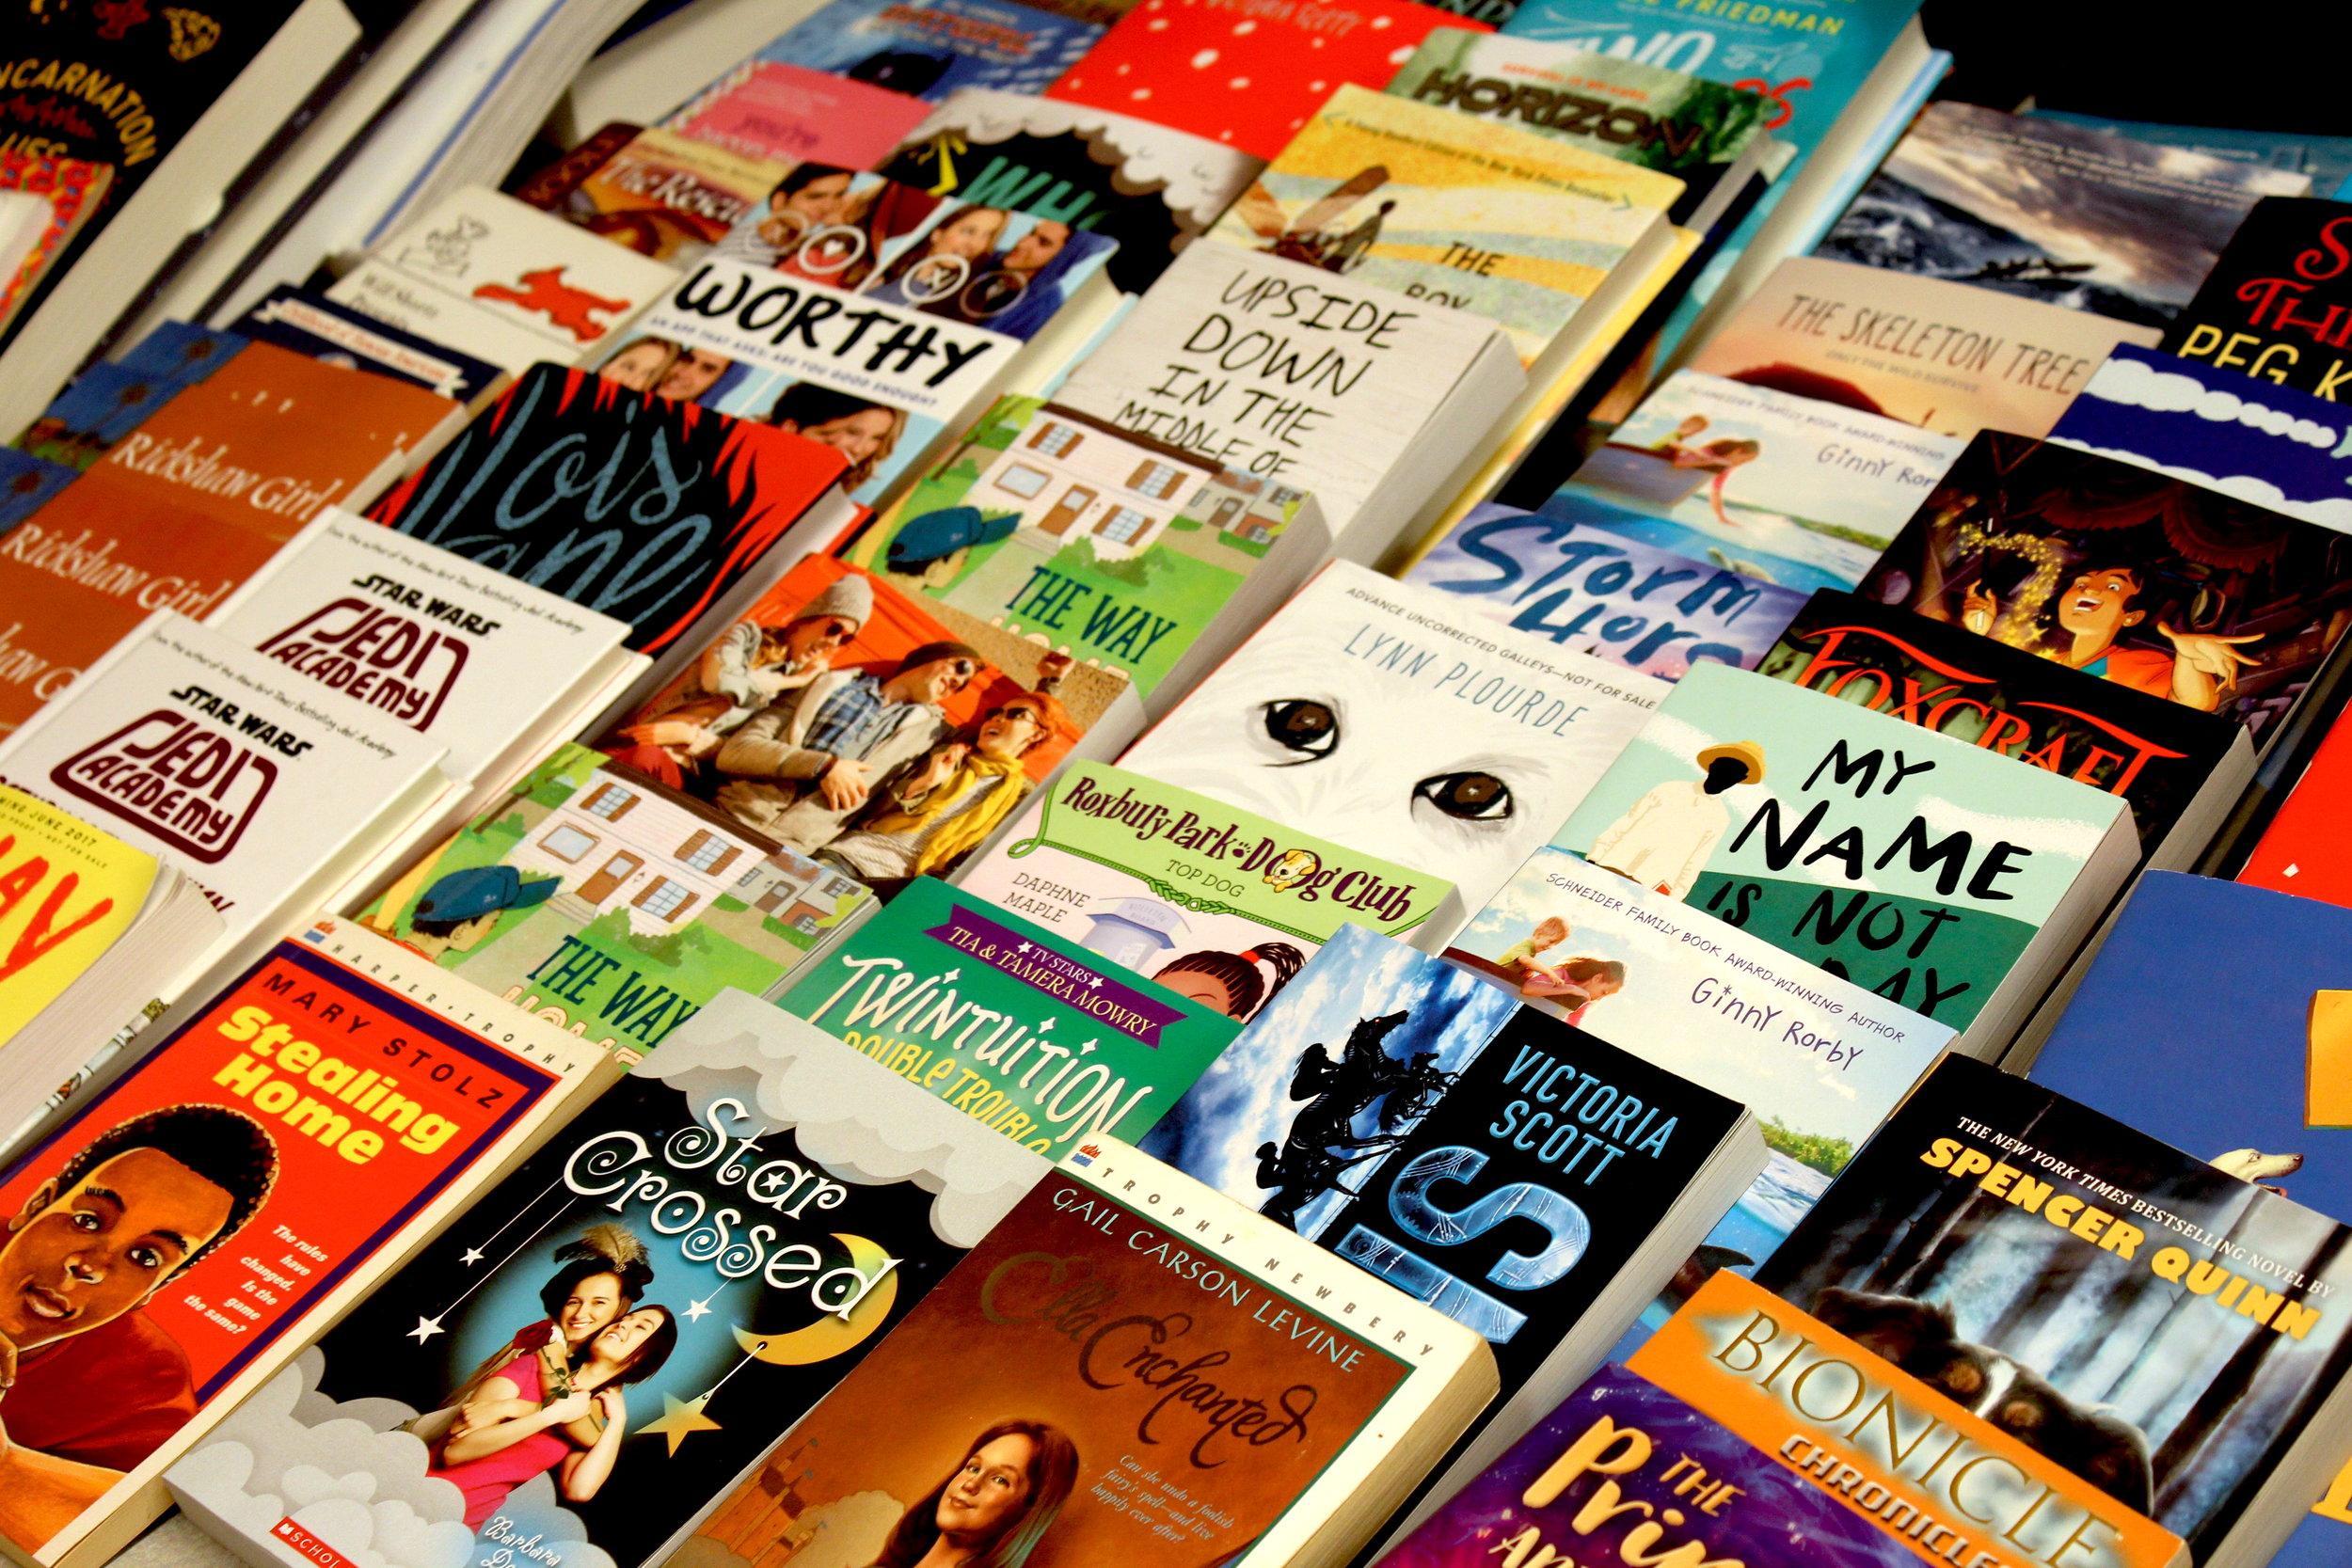 Bring on the Books Book Fair! - April 2017